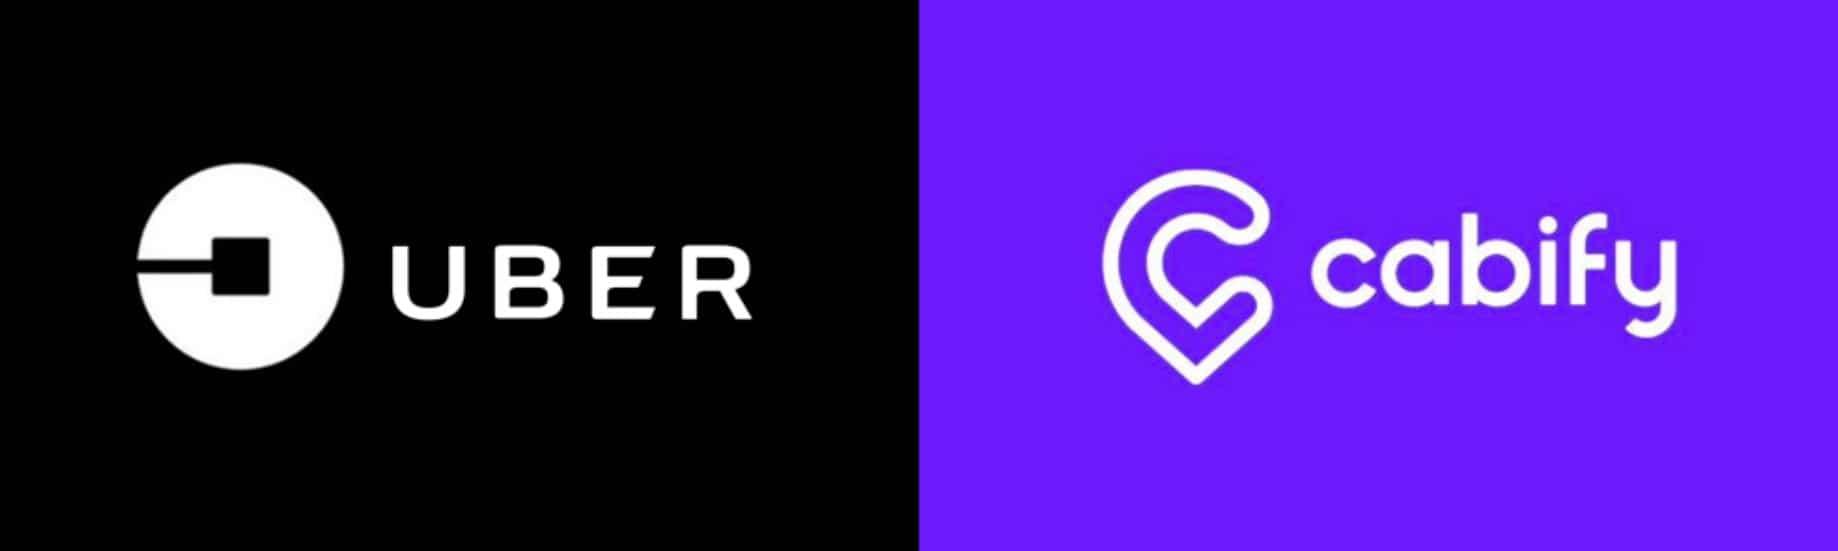 Indemnizacion Accidente Uber Cabify Madrid Abogados